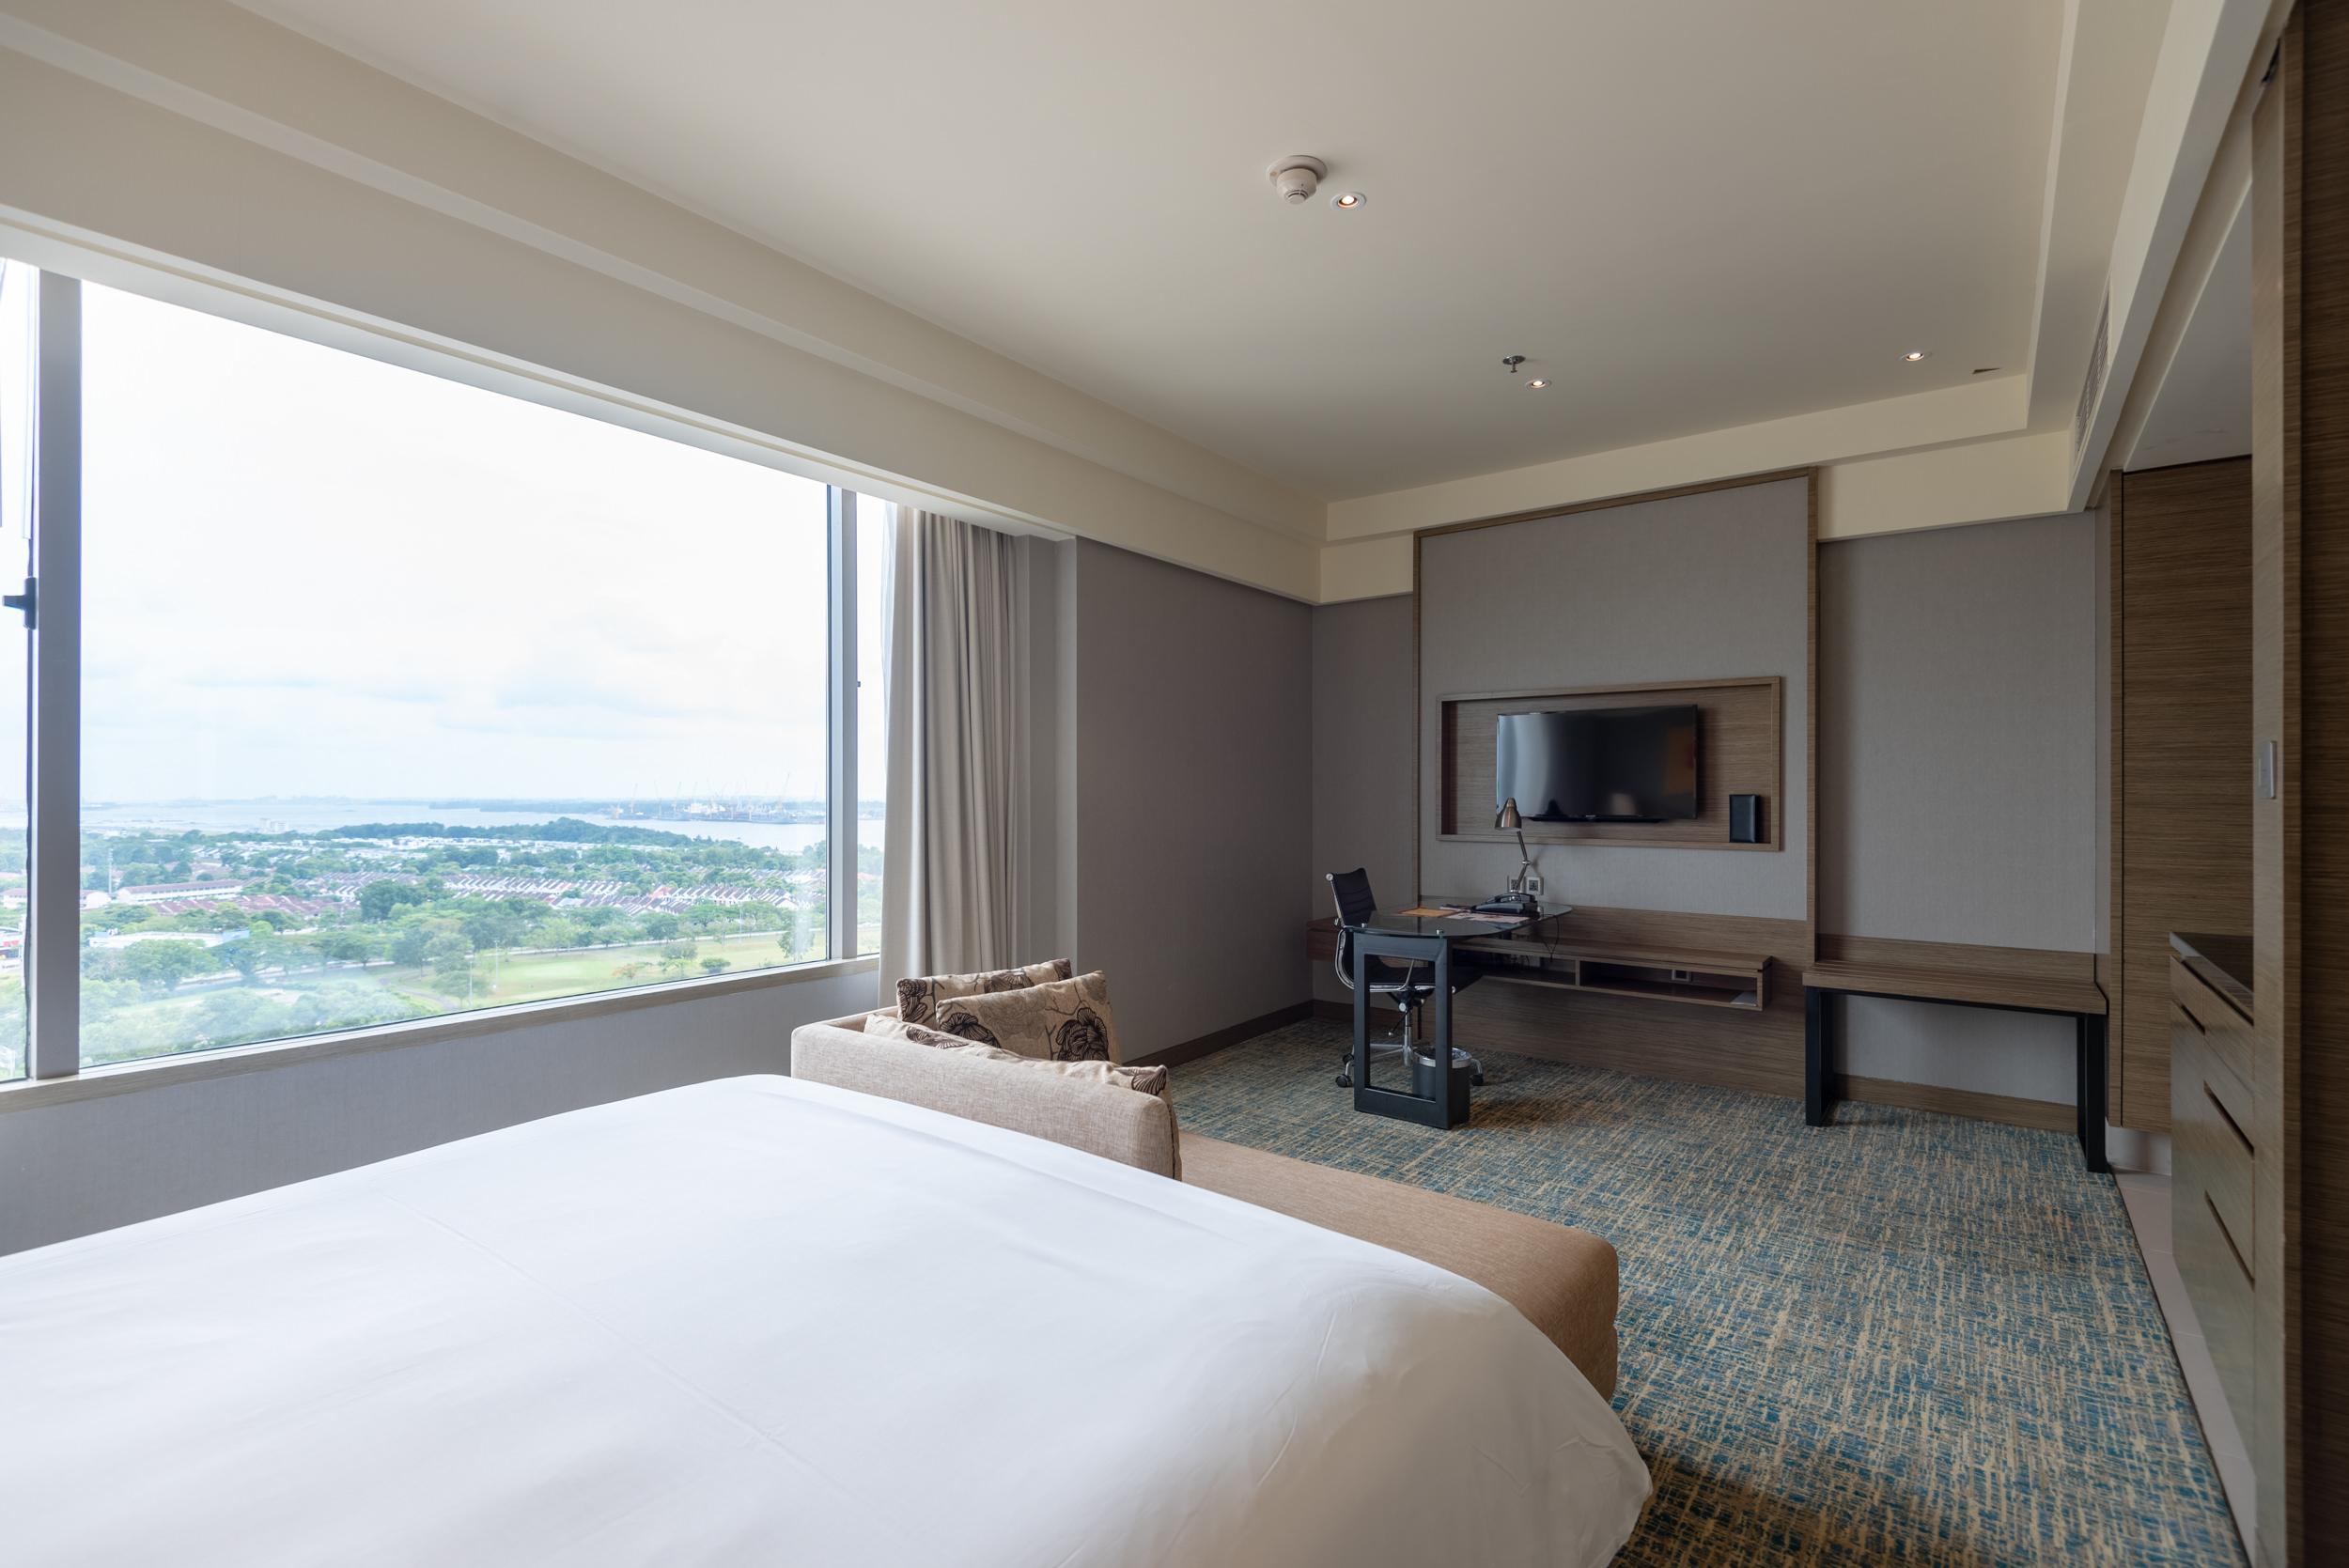 Work Desk and View  Club Room - Renaissance Johor Bahru Hotel